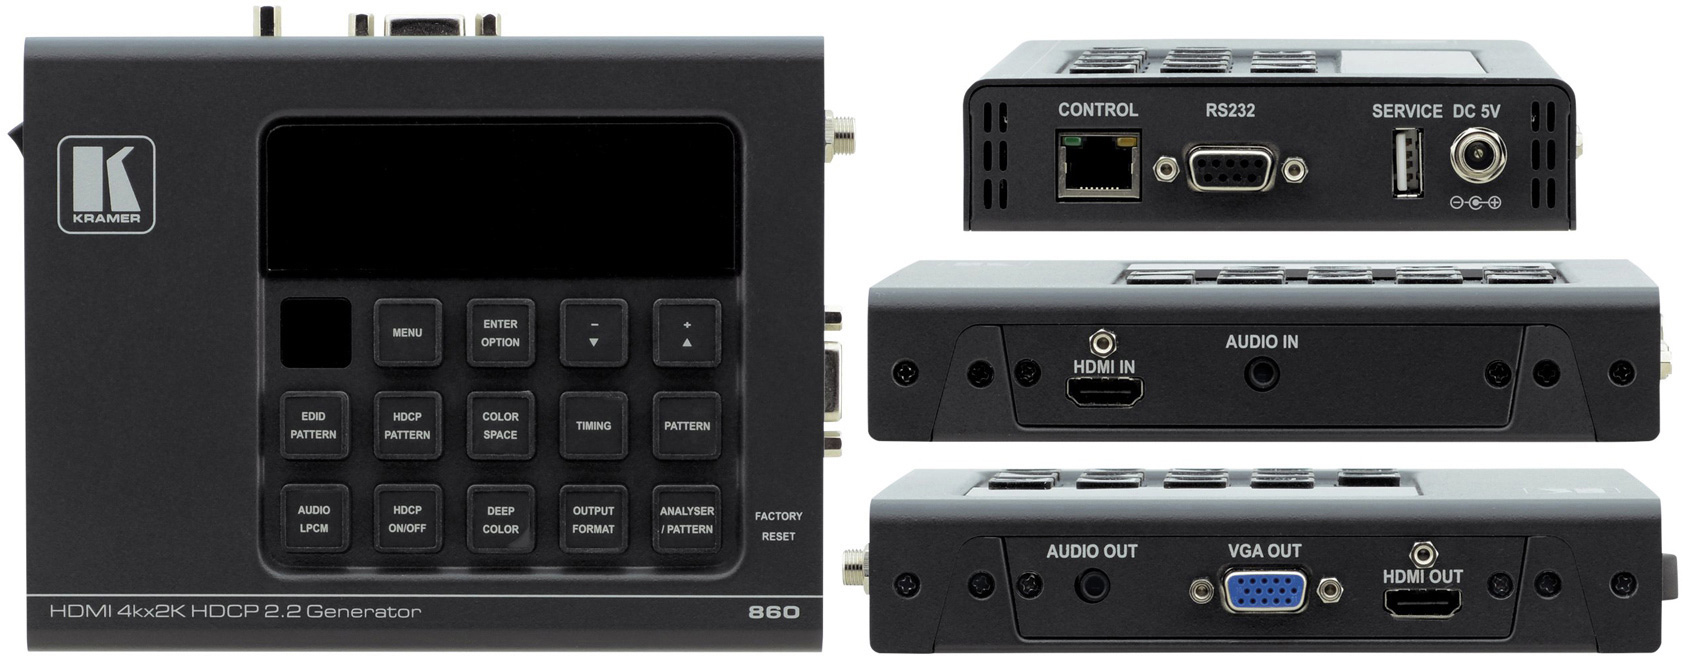 Kramer 860 4k60 444 Hdcp 22 Hdmi 20 6g Signal Generator Analyzer Tri Waveform